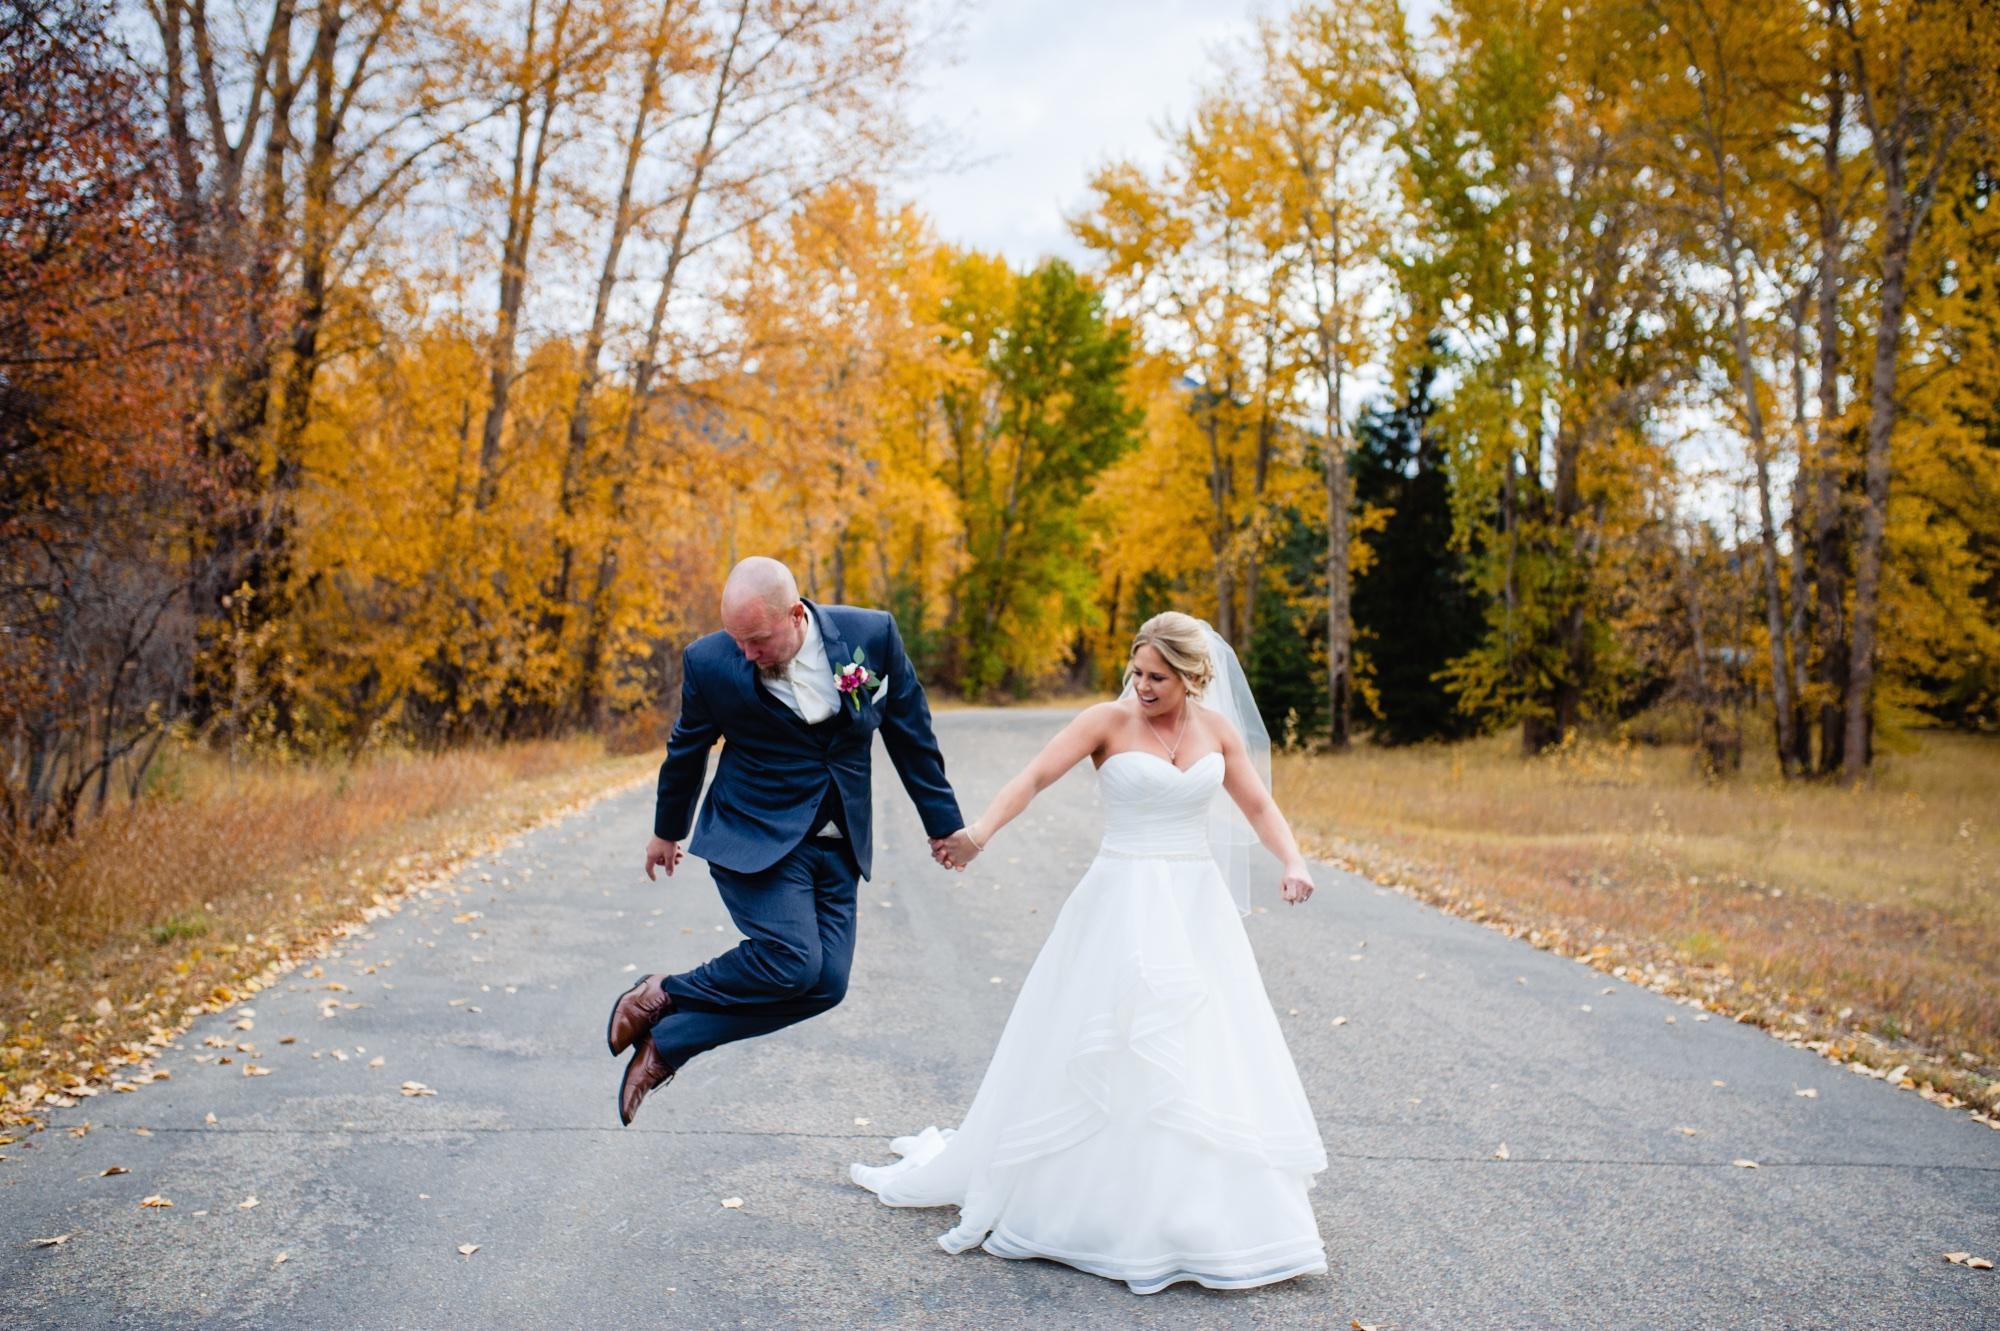 lindseyjane_wedding028.jpg